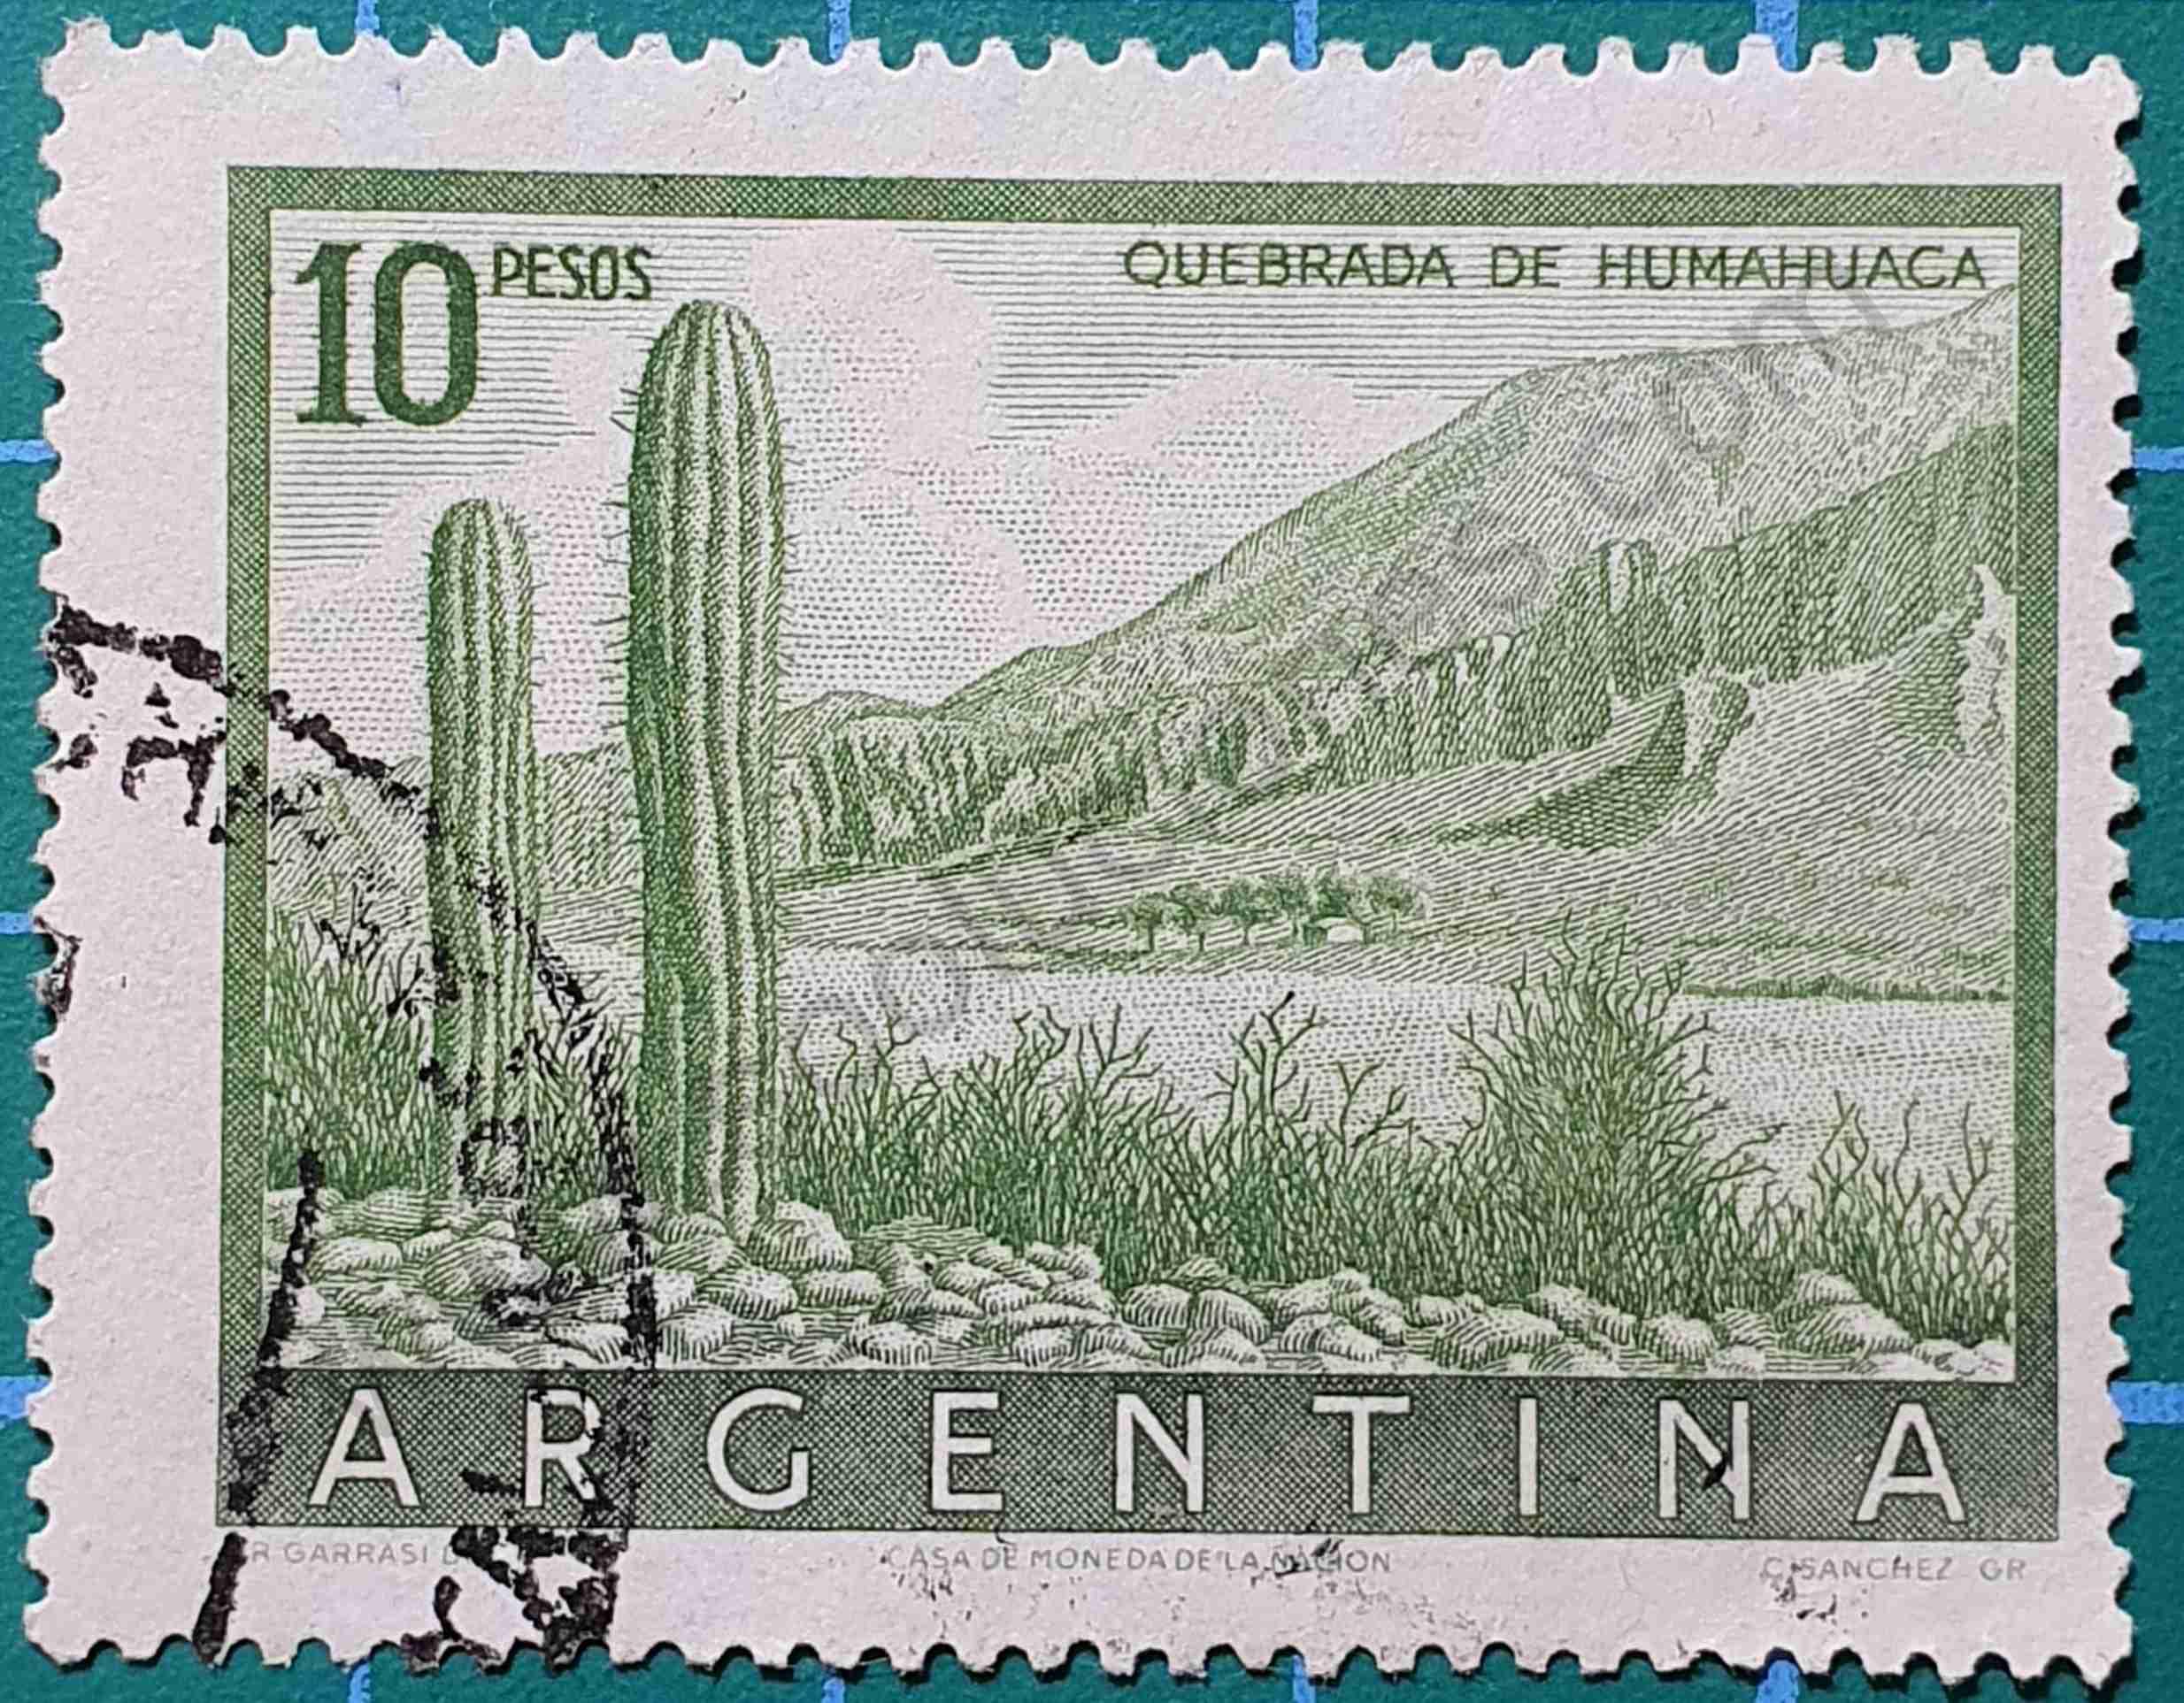 Quebrada de Humahuaca - Sello Argentina 1955